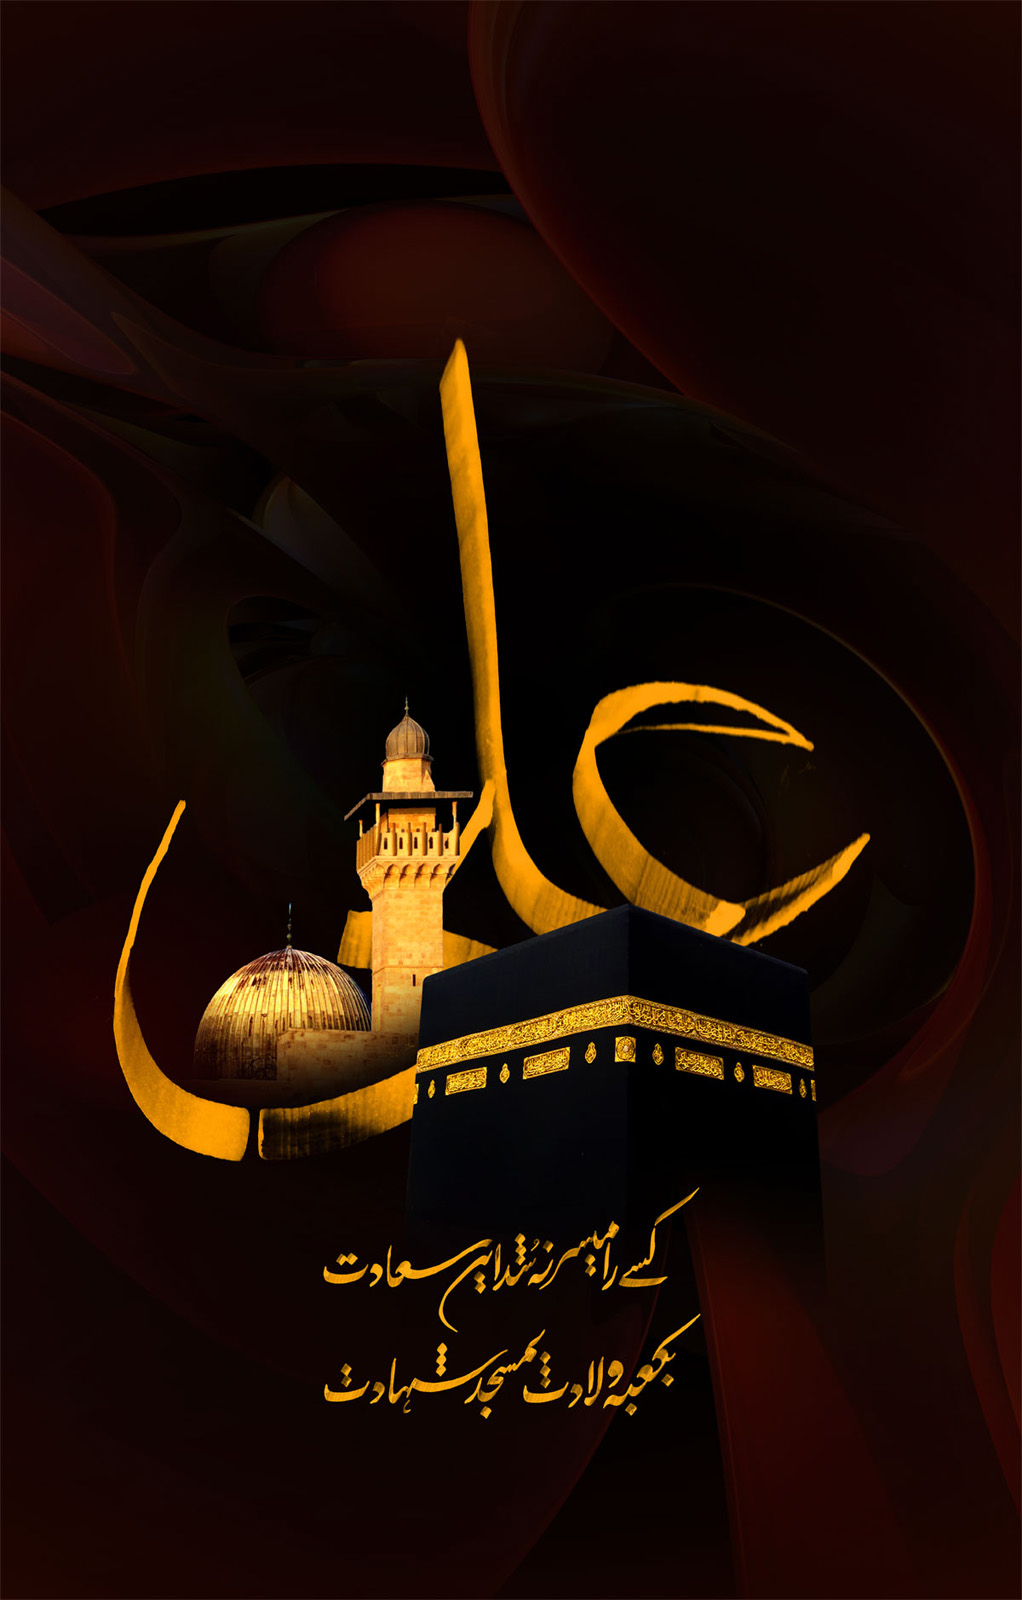 Shia Islamic Wallpapers With Quotes Calligraphy Mazhar Hussain Portfolio